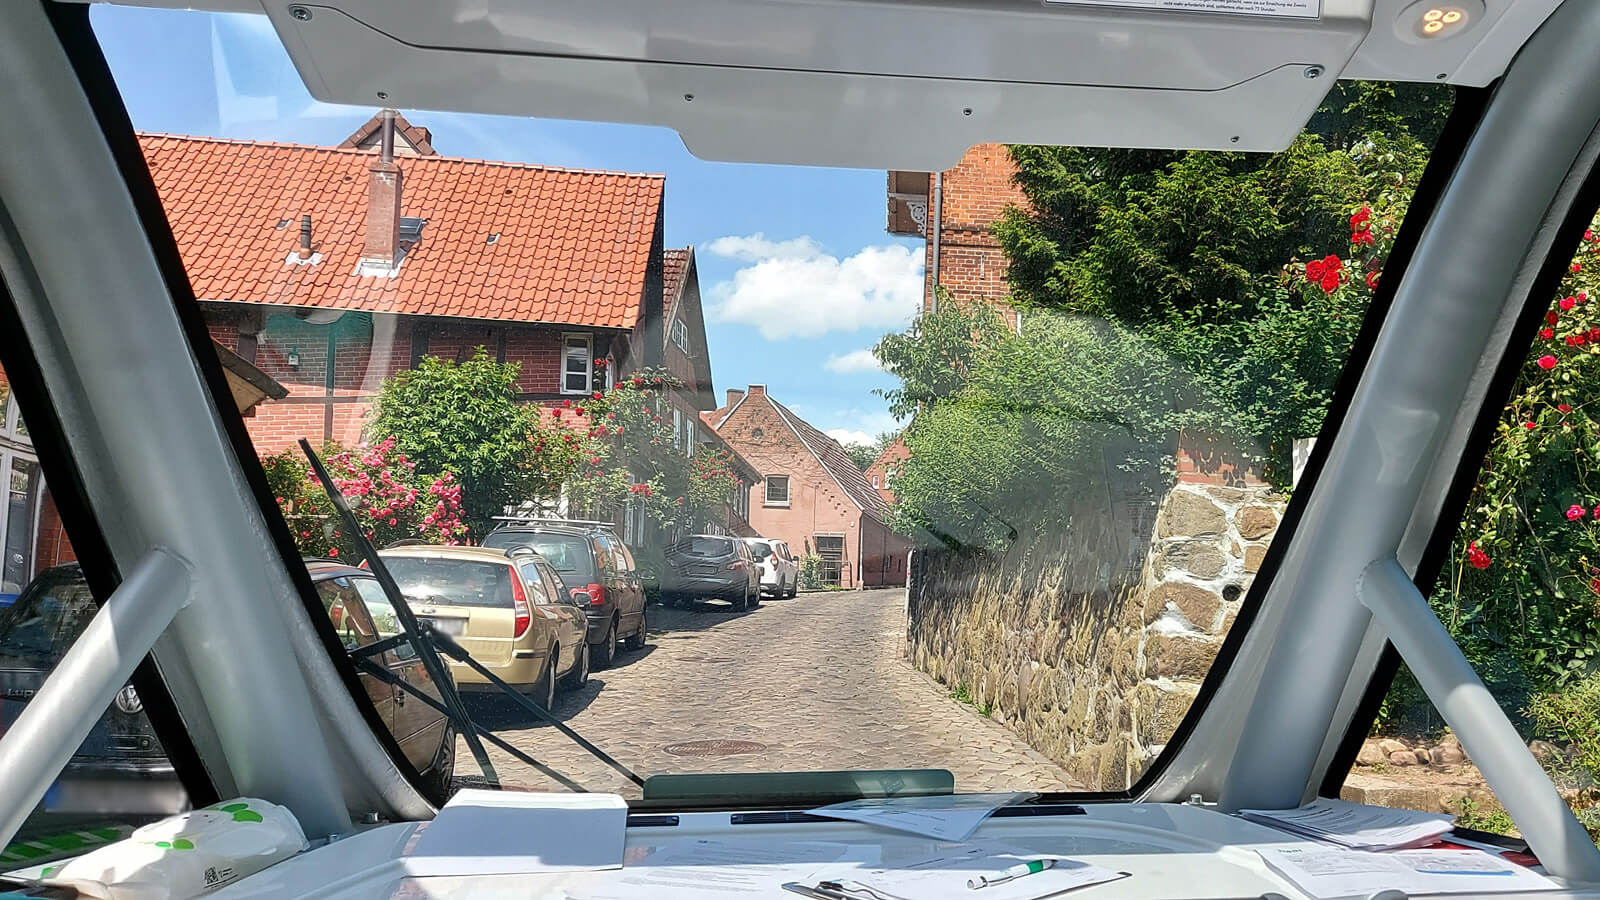 Blick aus dem TaBuLa-Shuttle in Lauenburg.